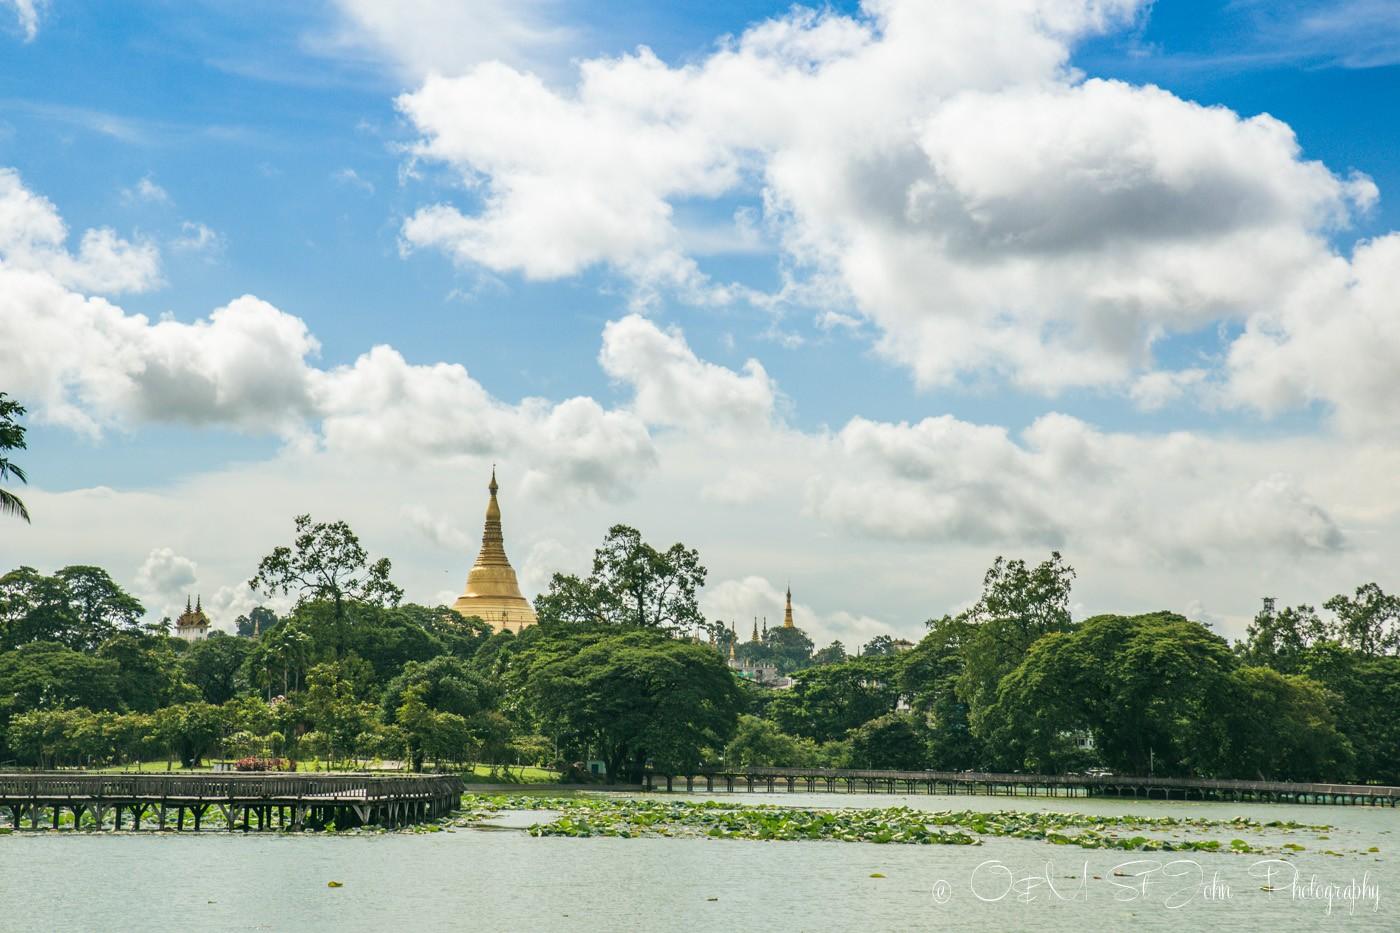 3 days in Yangon: Shwedagon Pagoda as seen from inside the Kandawgyi Park